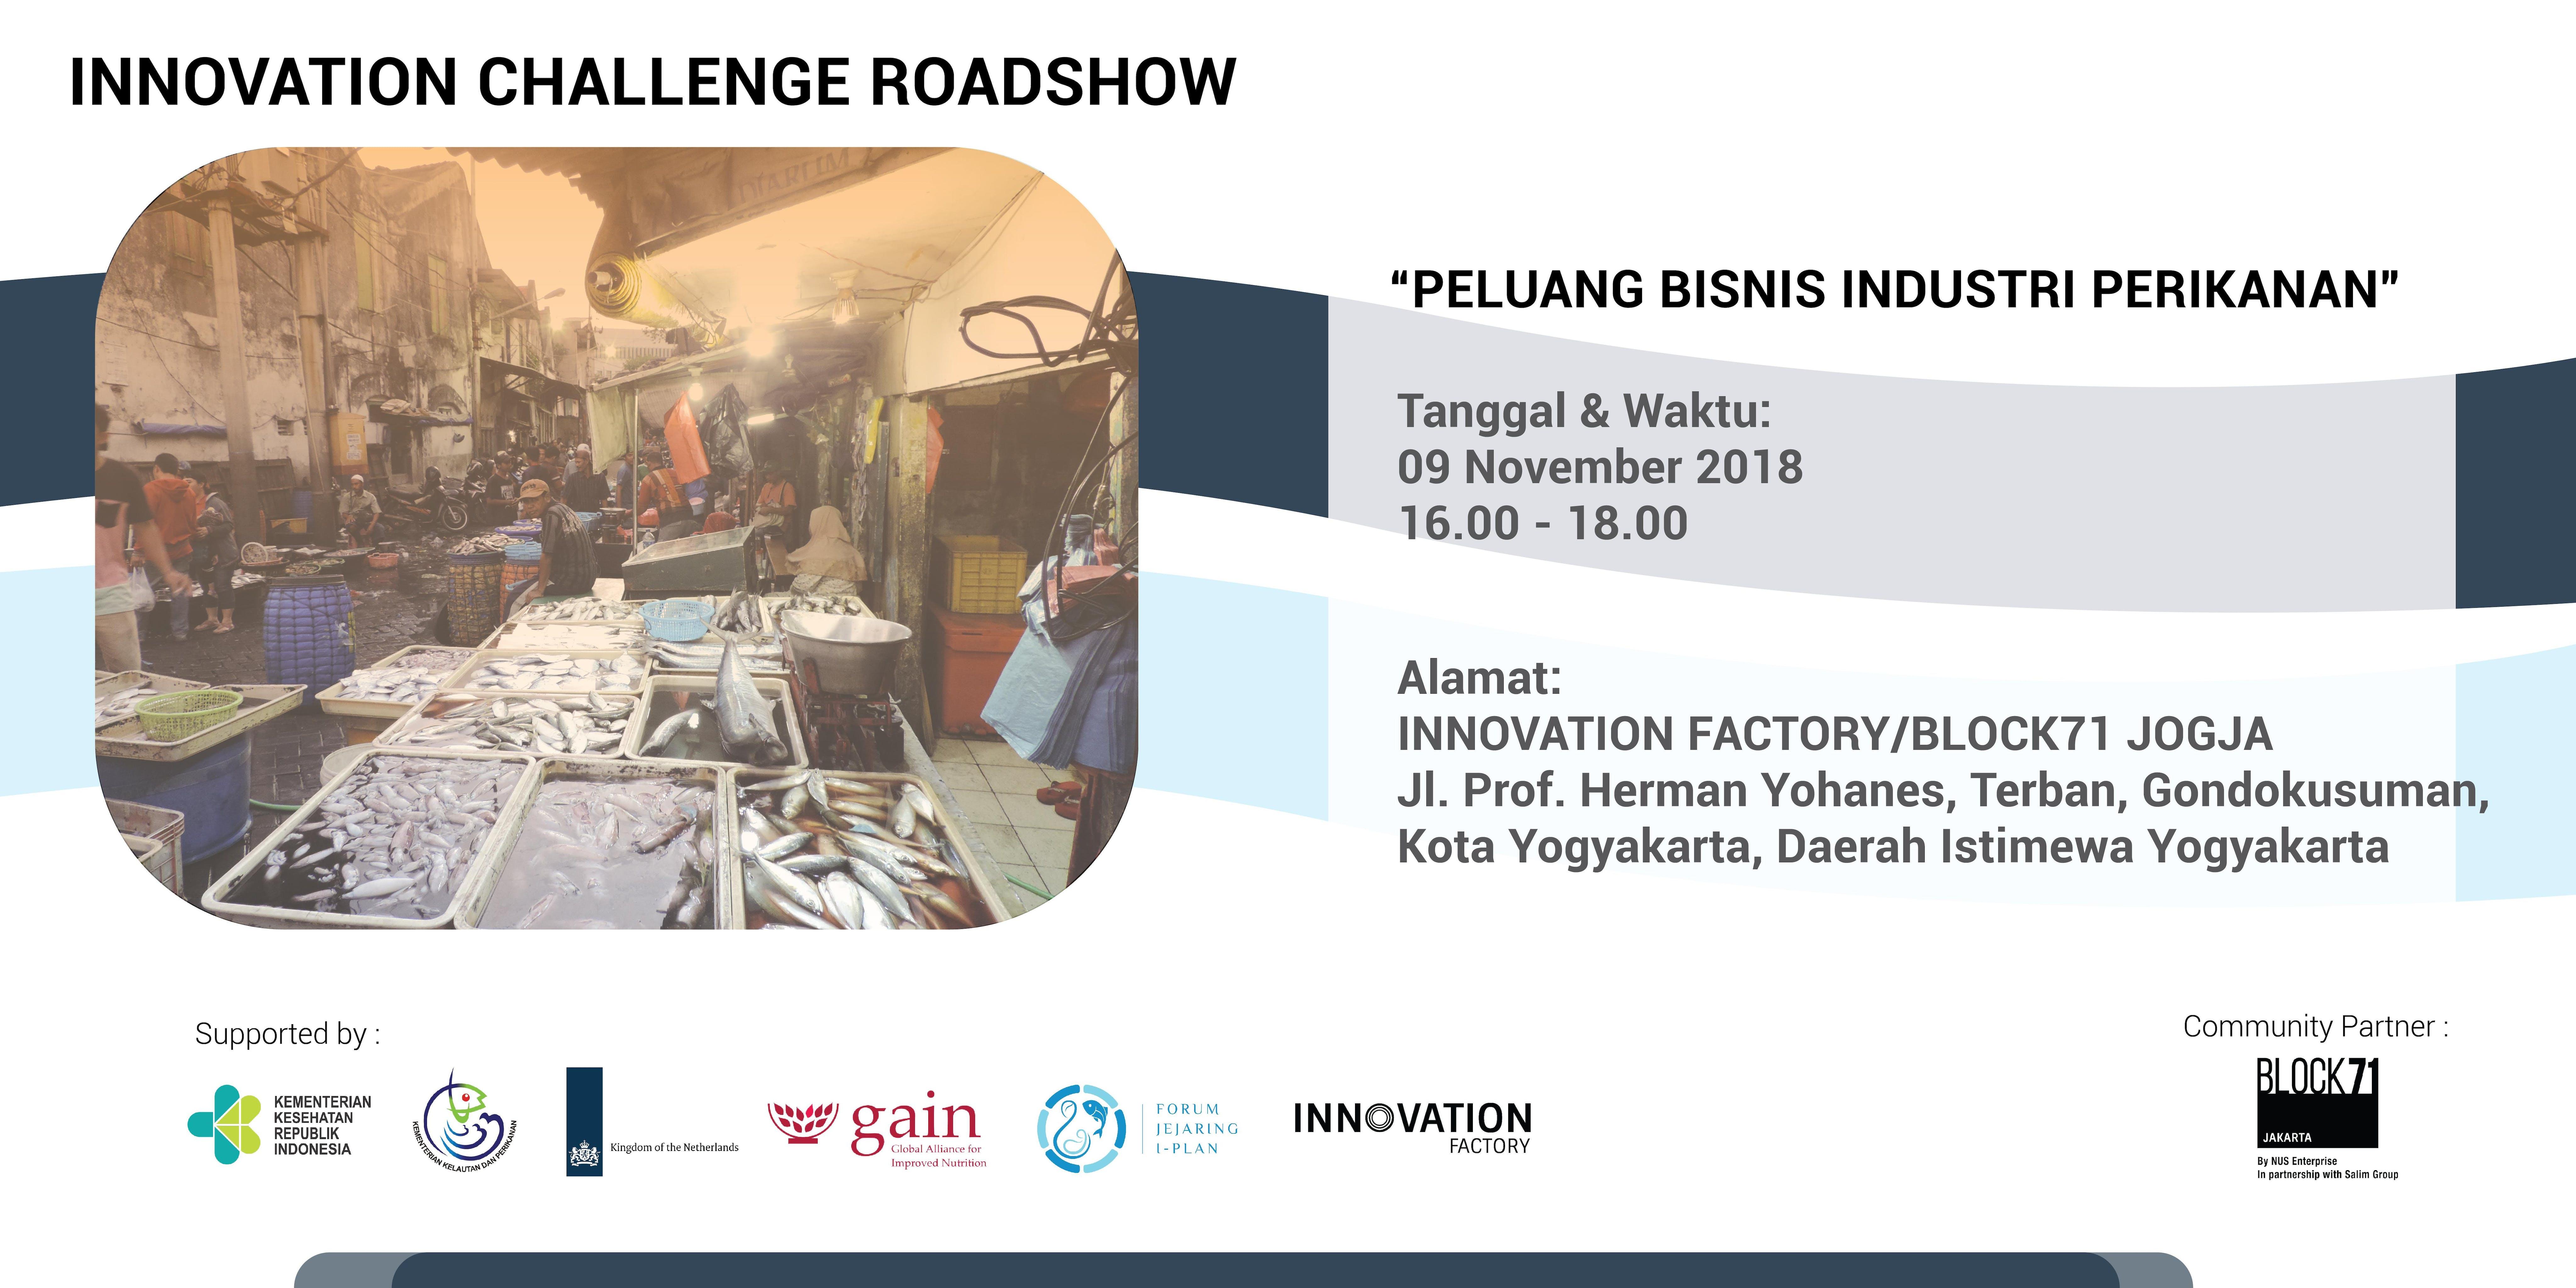 Iplan Innovation Challenge Present Peluang Bisnis Industri Perikanan